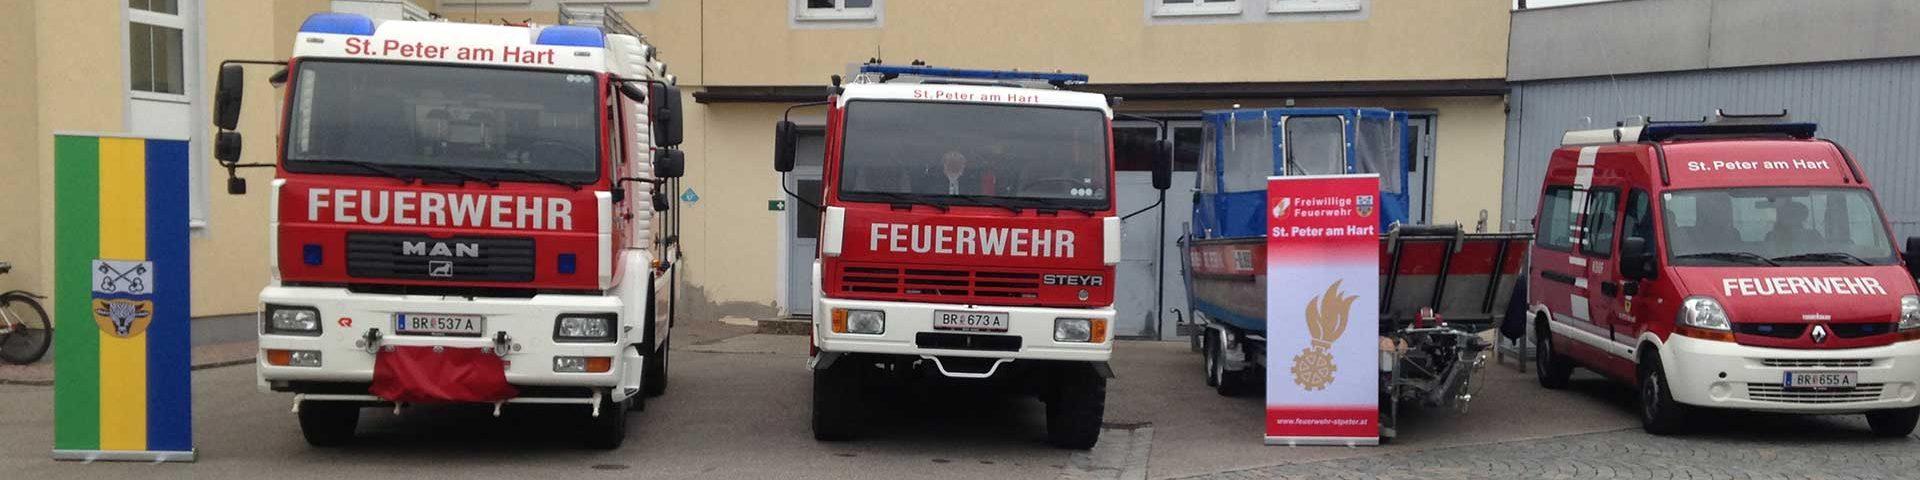 Freiwillige Feuerwehr St. Peter am Hart